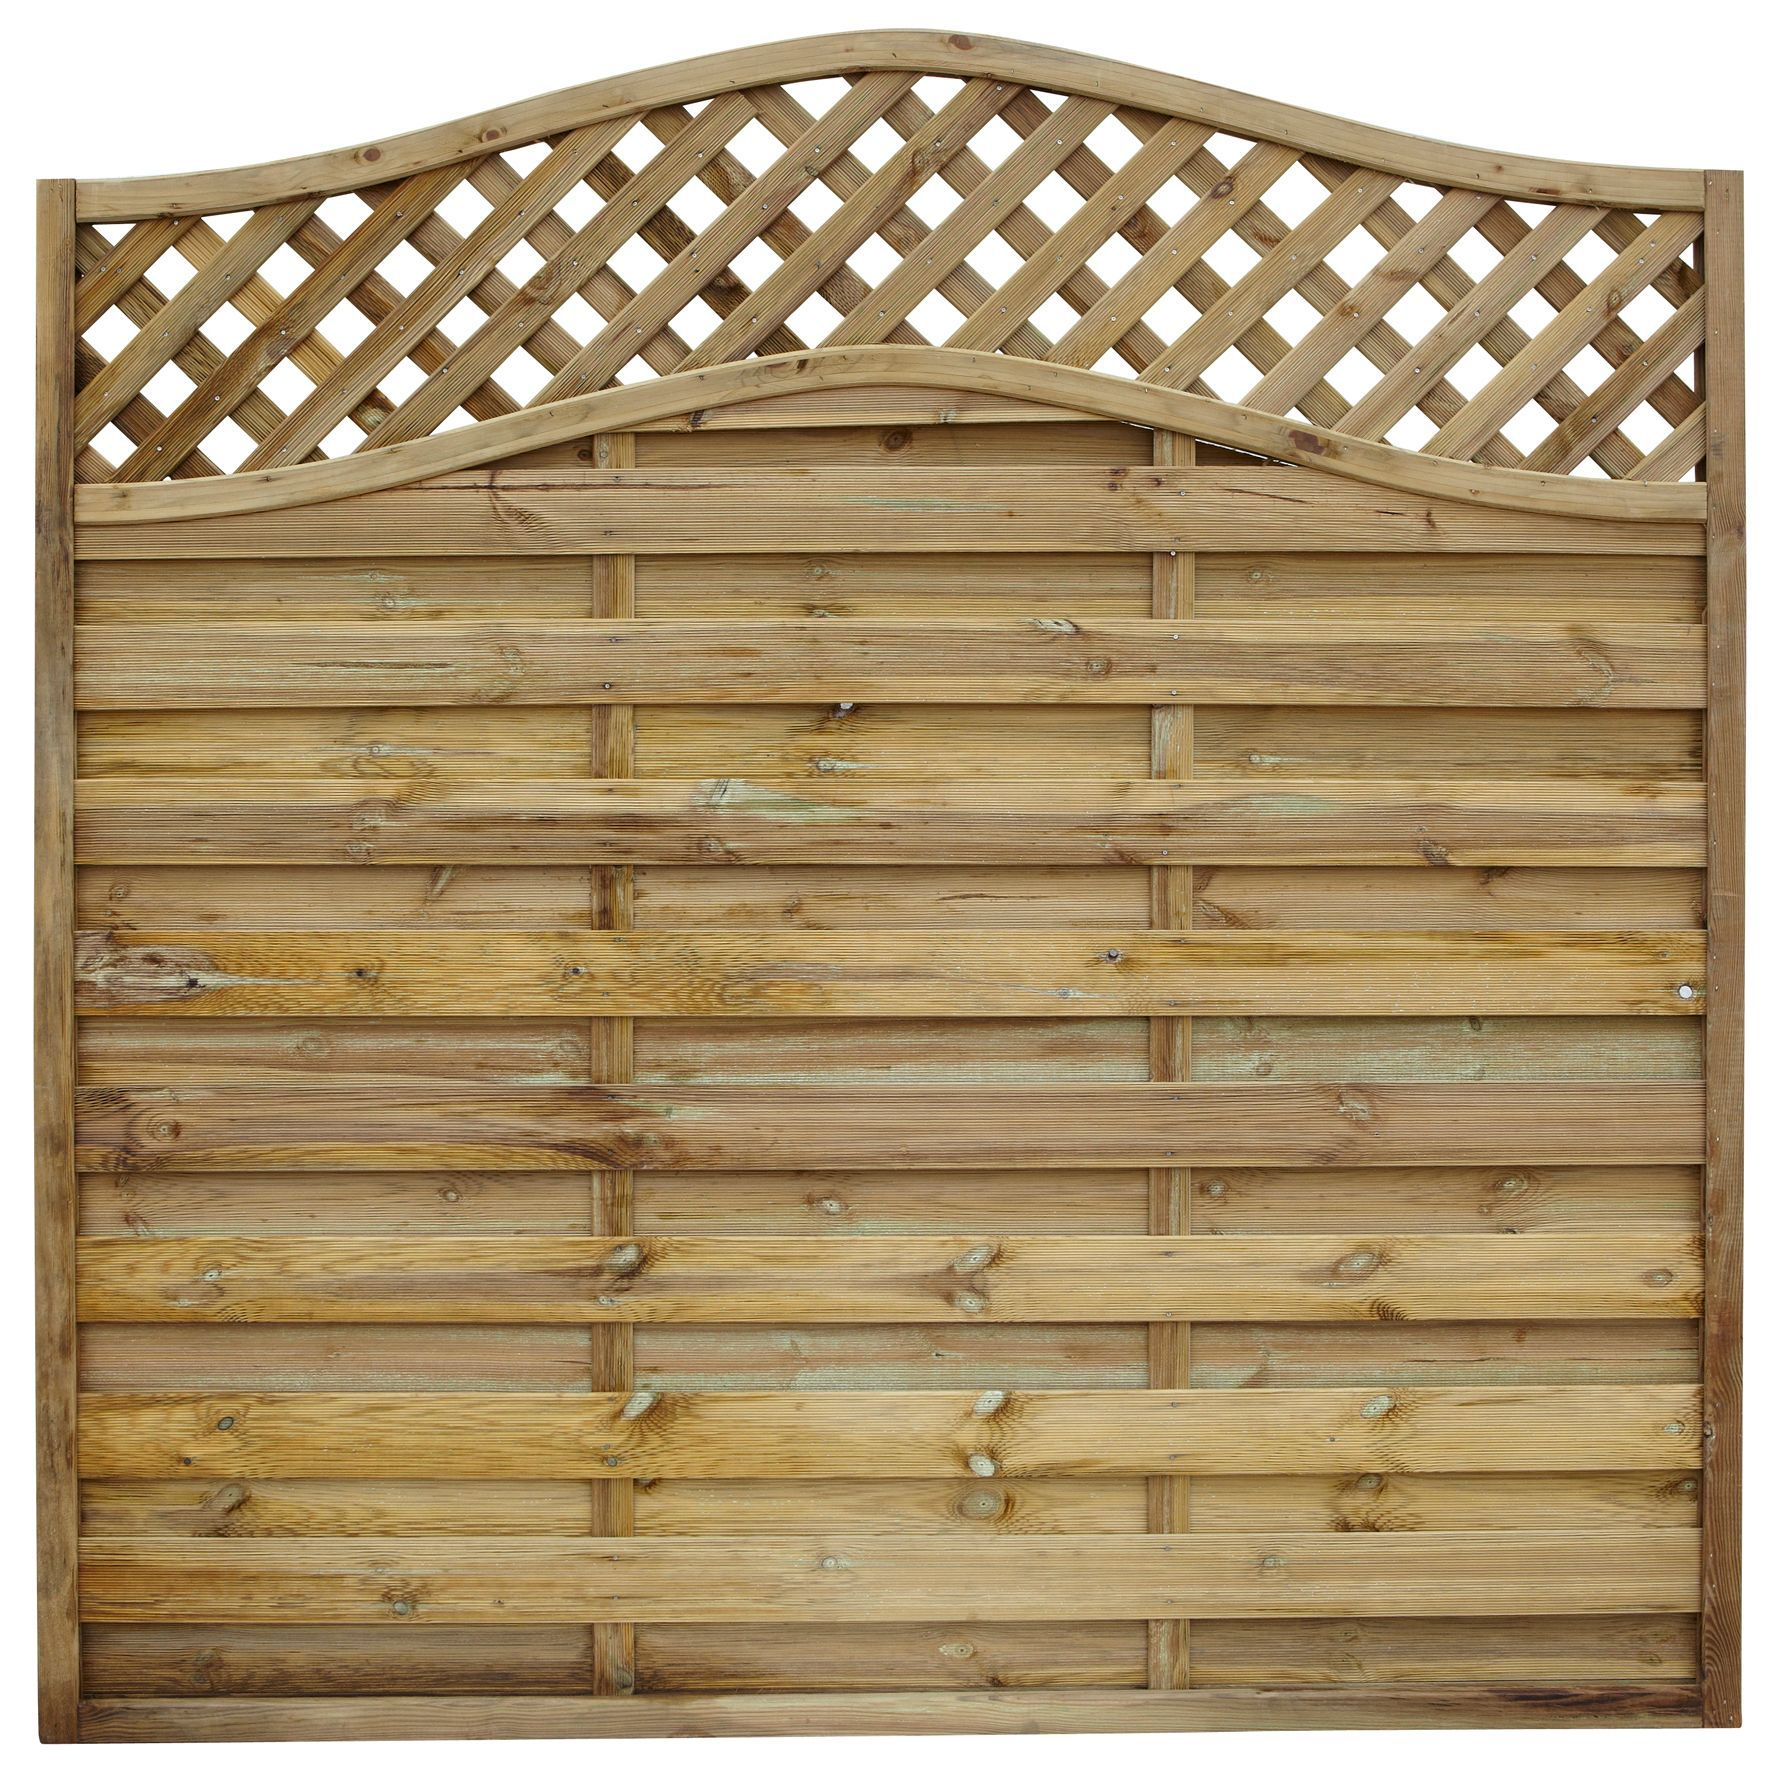 Grange Woodbury Premium Slatted Fence Panel W 1 8 M H 1